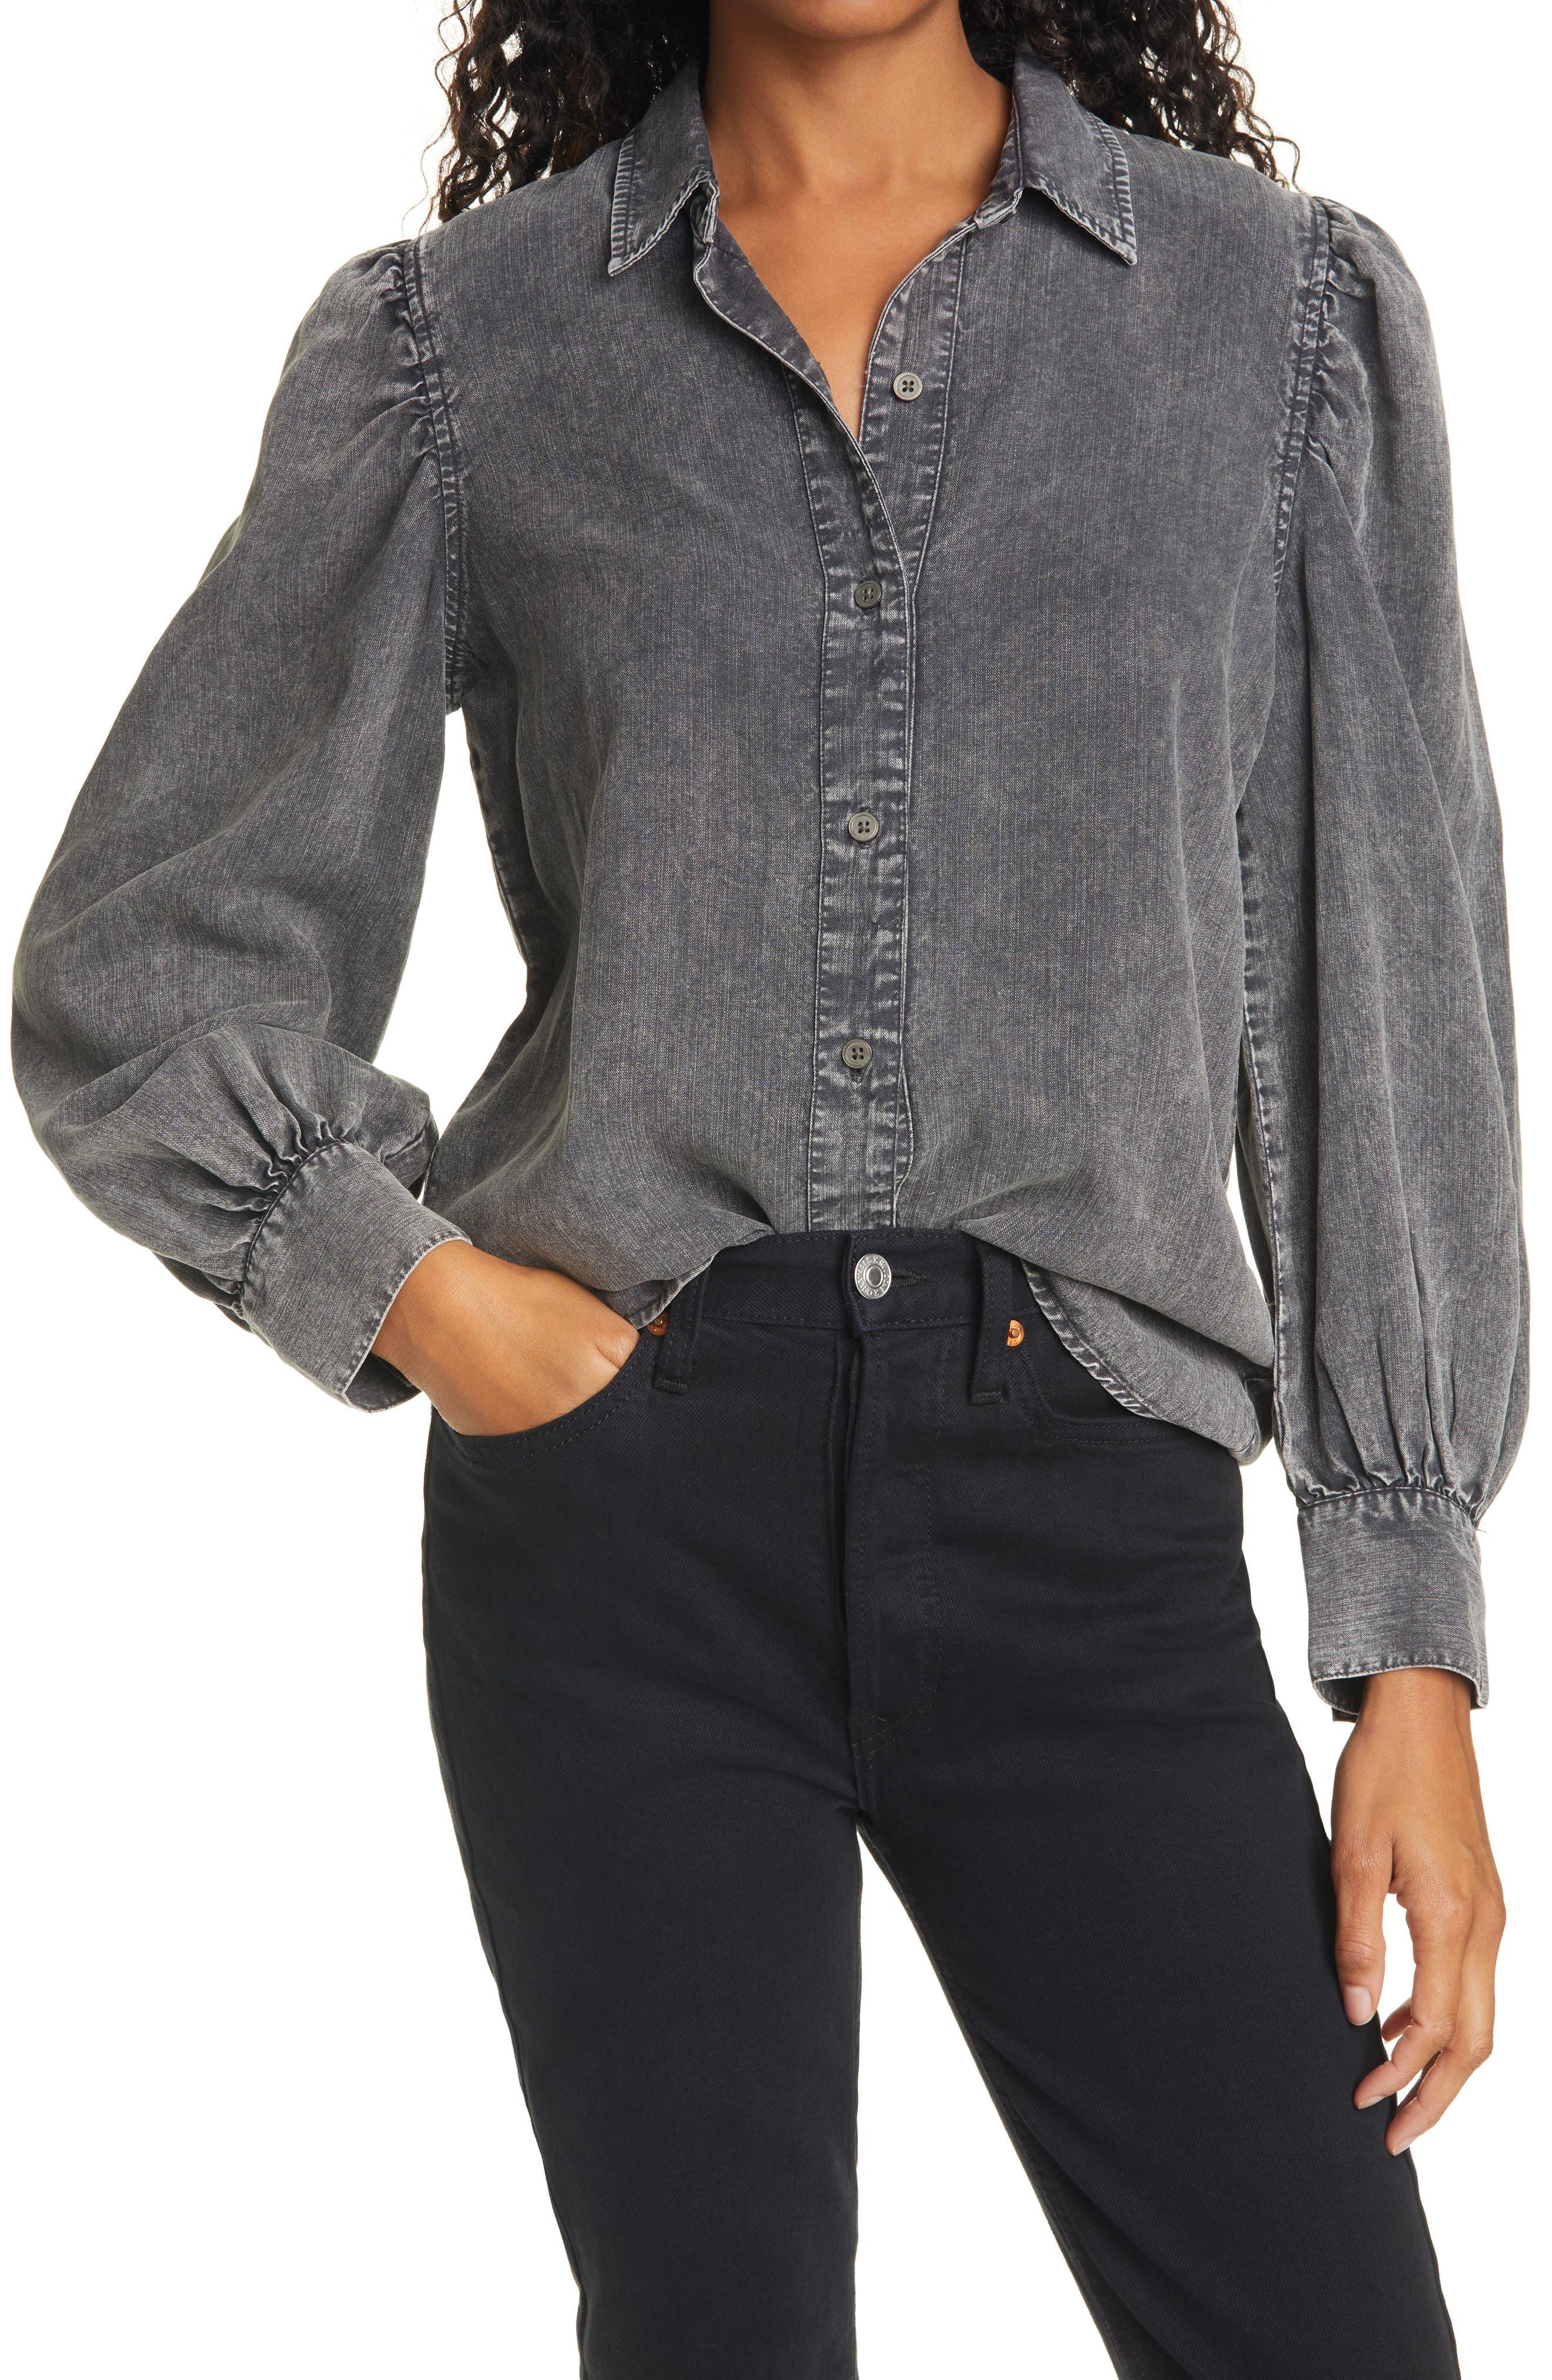 Max Studio London Womens Utility Button Up Shirt